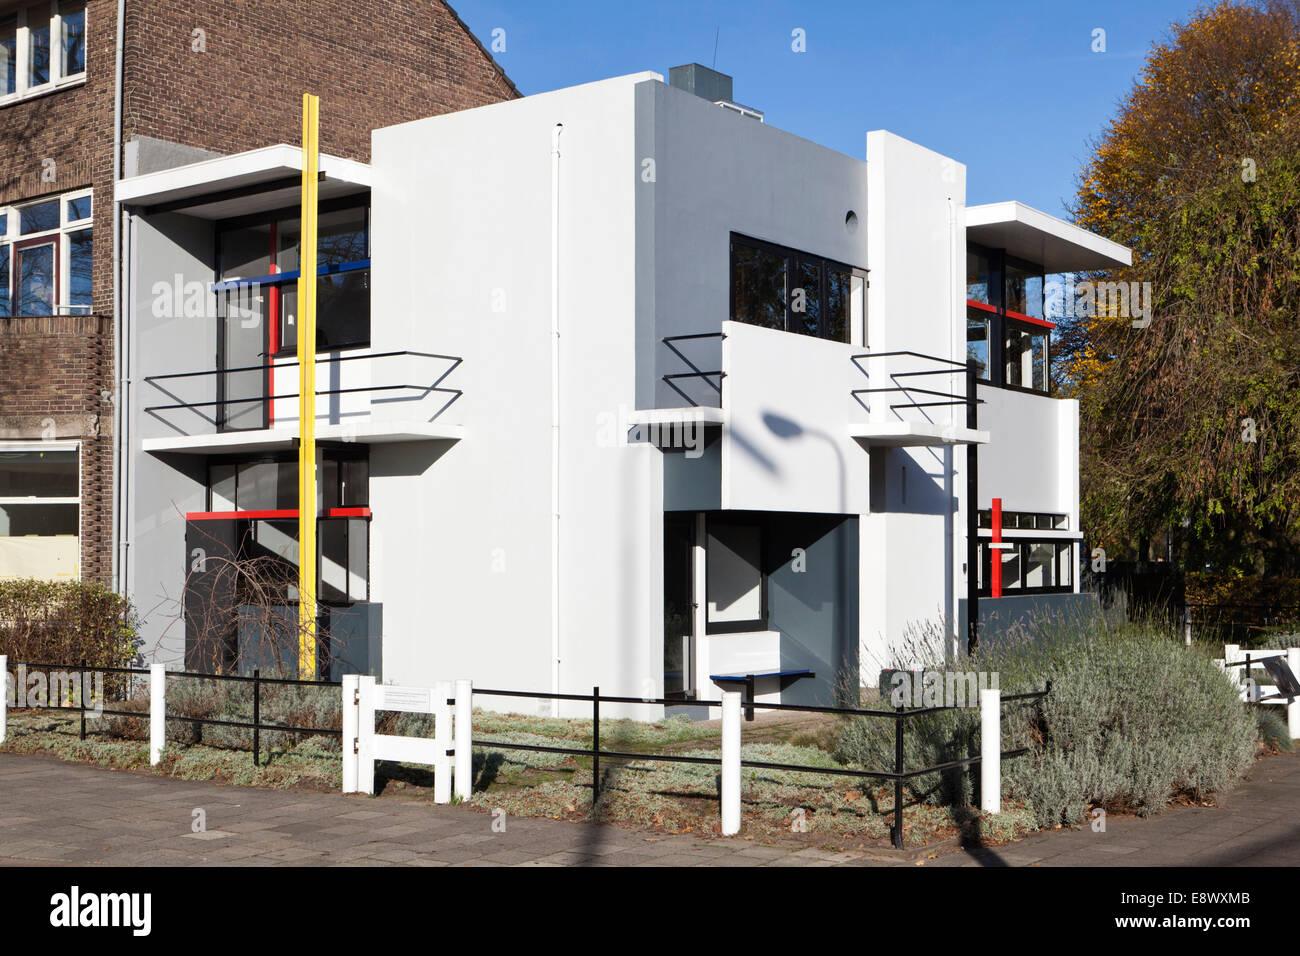 Rietveld Schröder Haus Prins Hendriklaan 50 Utrecht Niederlande